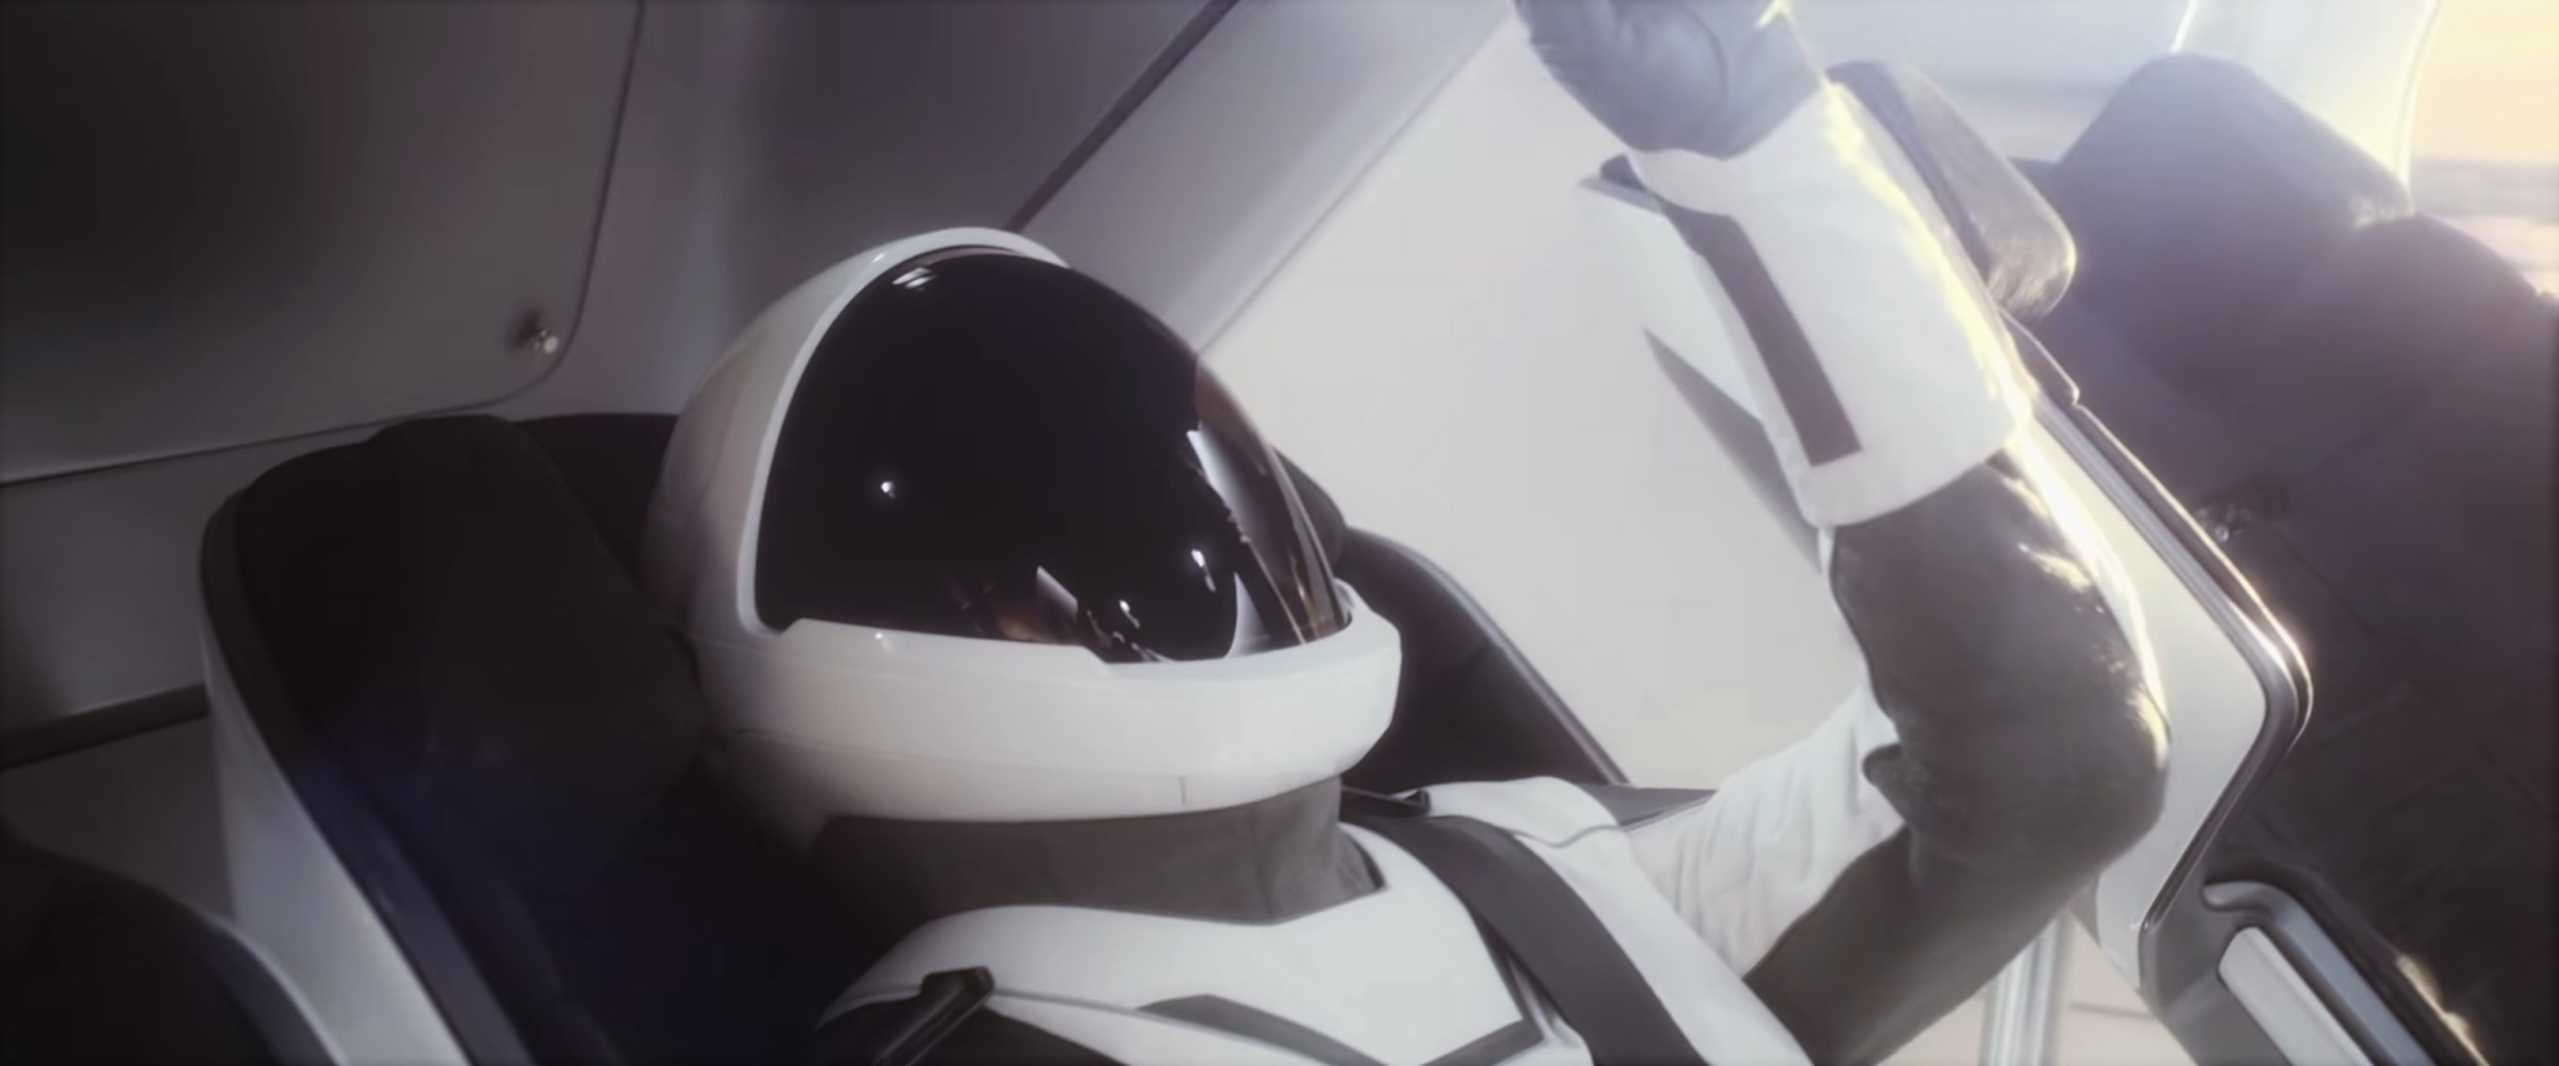 Crew Dragon Demo-2 animation Dec 2019 (SpaceX) astronauts 2 (c)